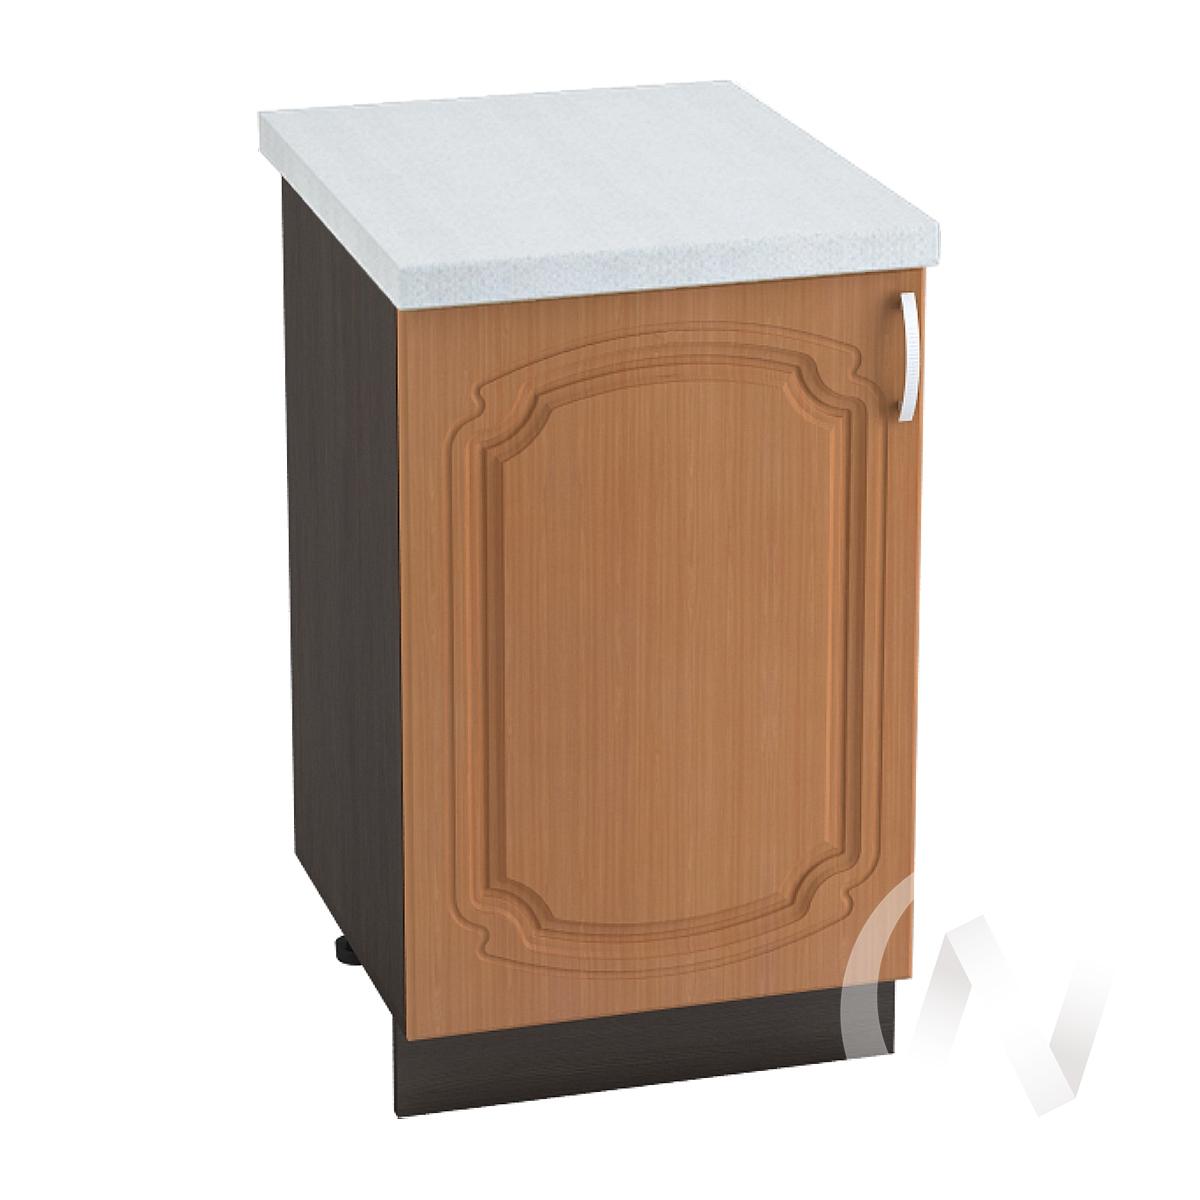 "Кухня ""Настя"": Шкаф нижний 500, ШН 500 (Орех миланский/корпус венге)"